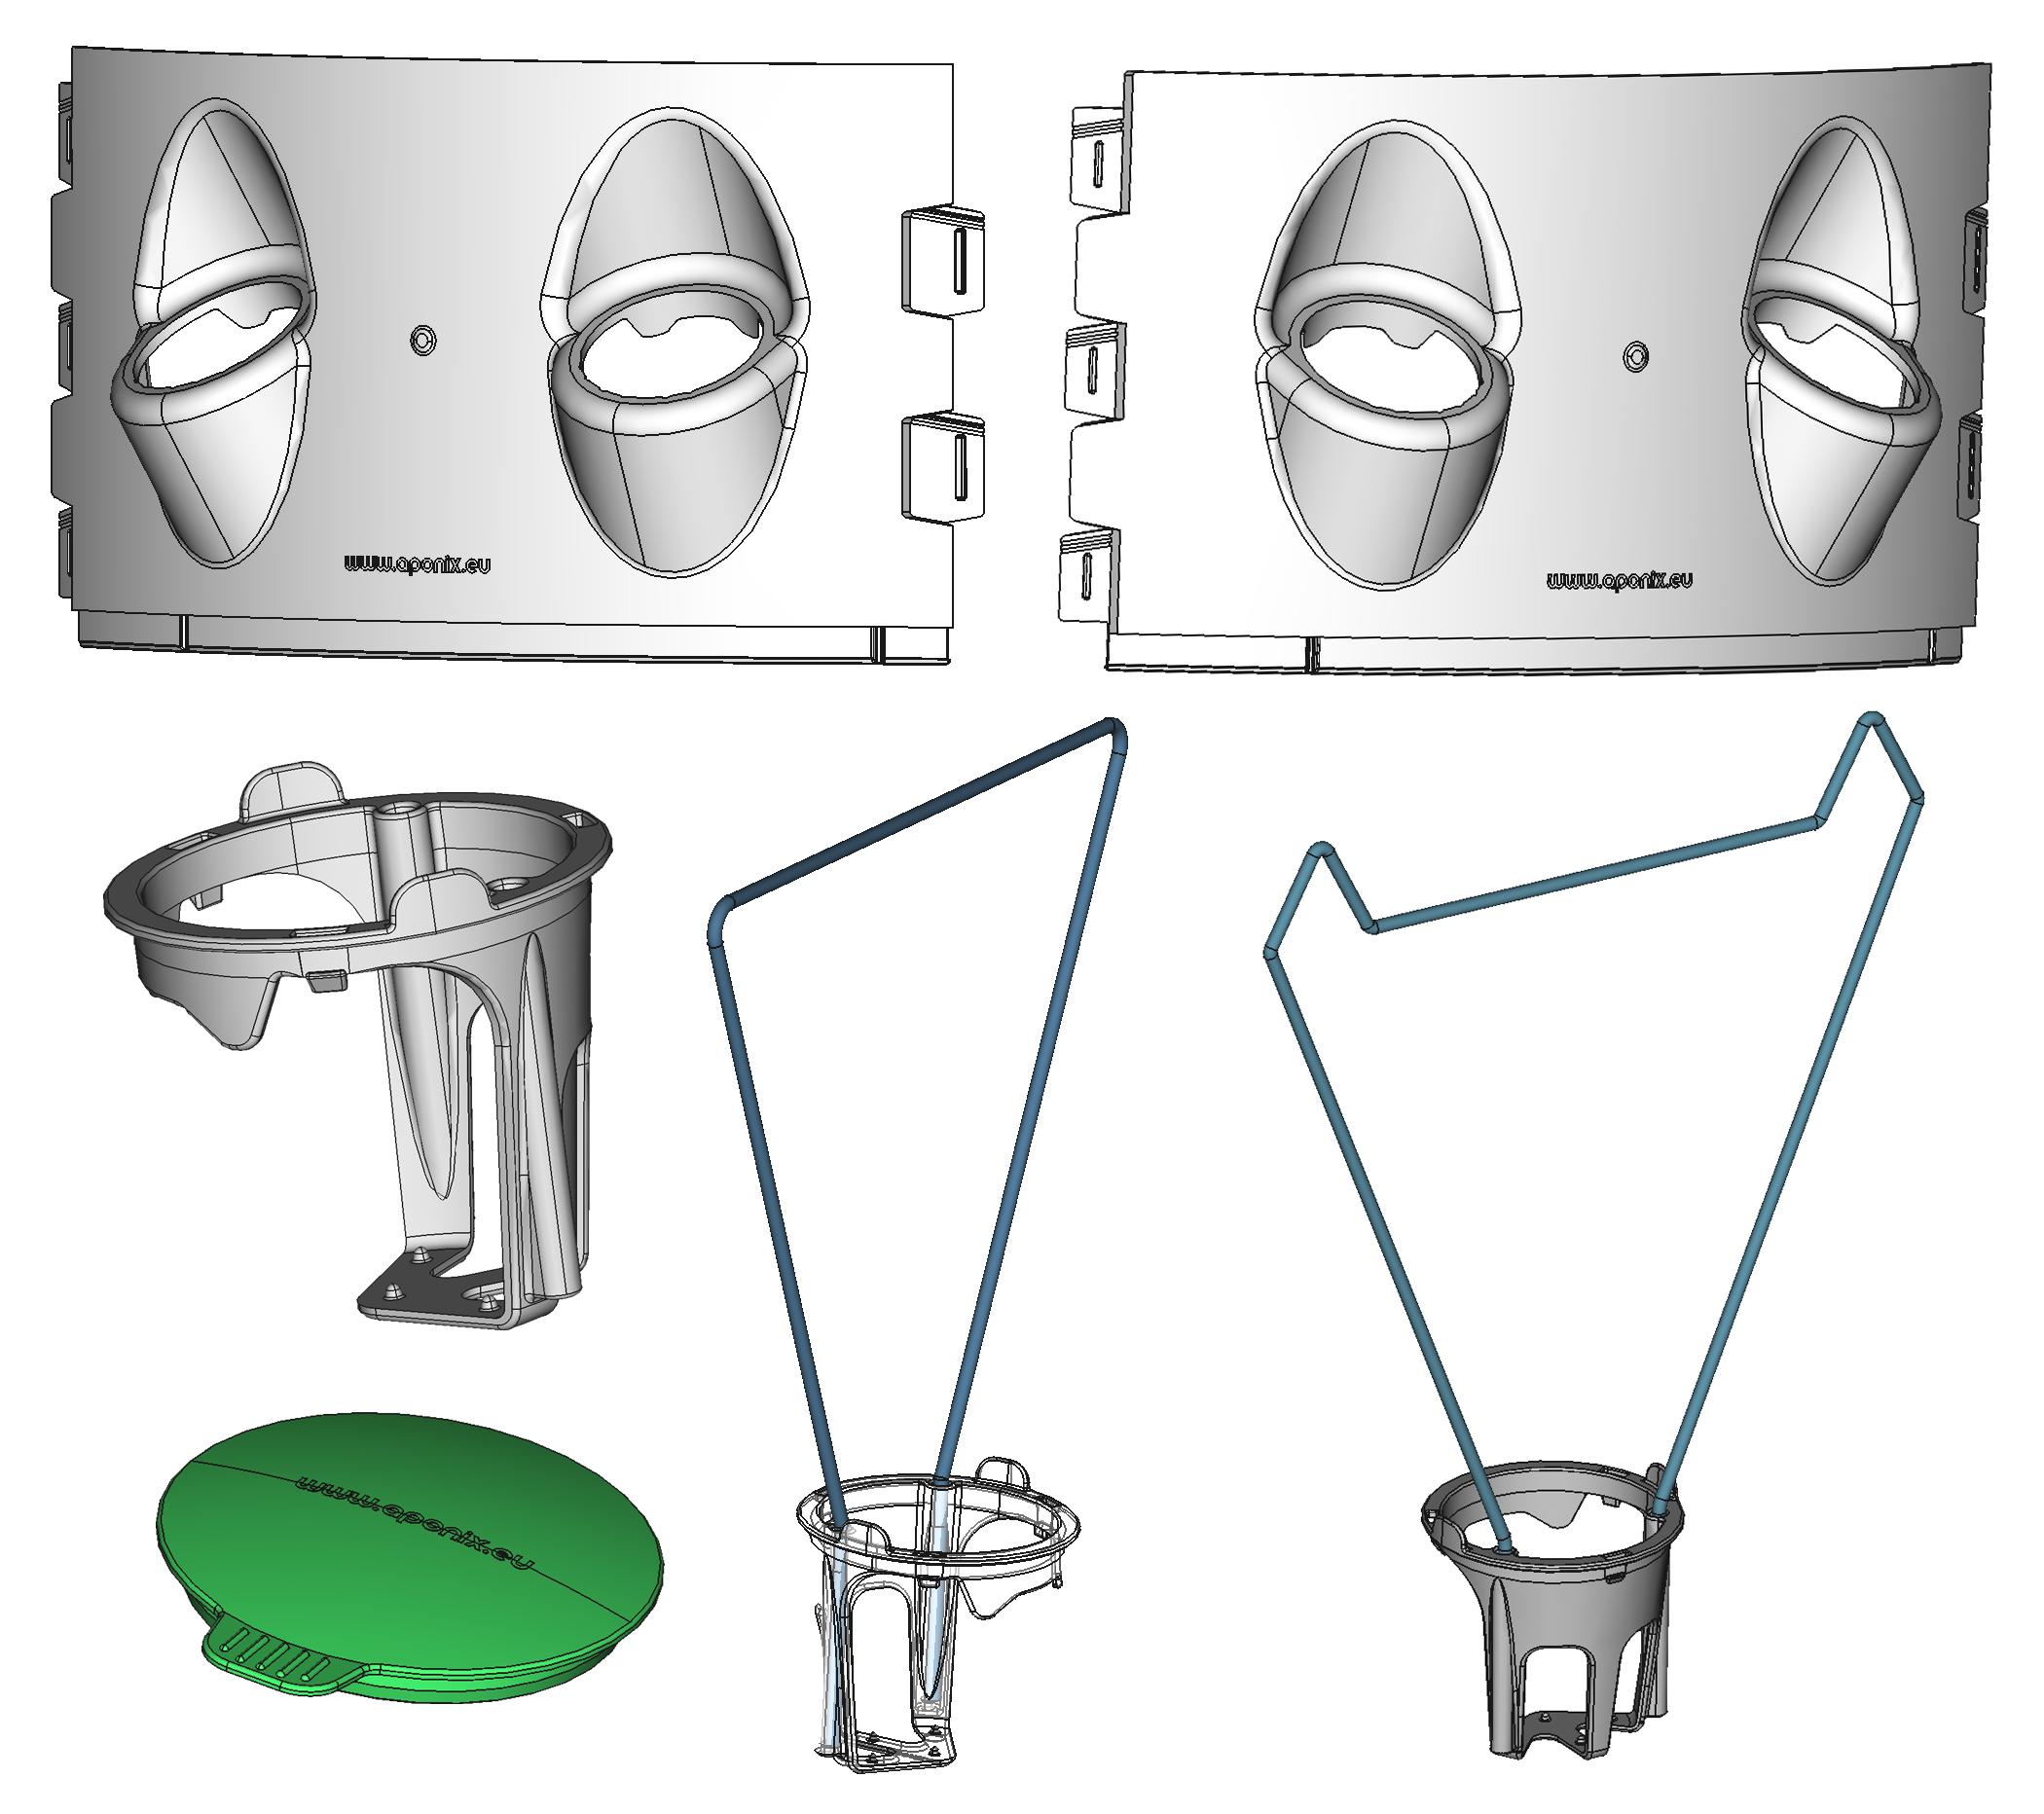 aponix-V3-pieces-overview